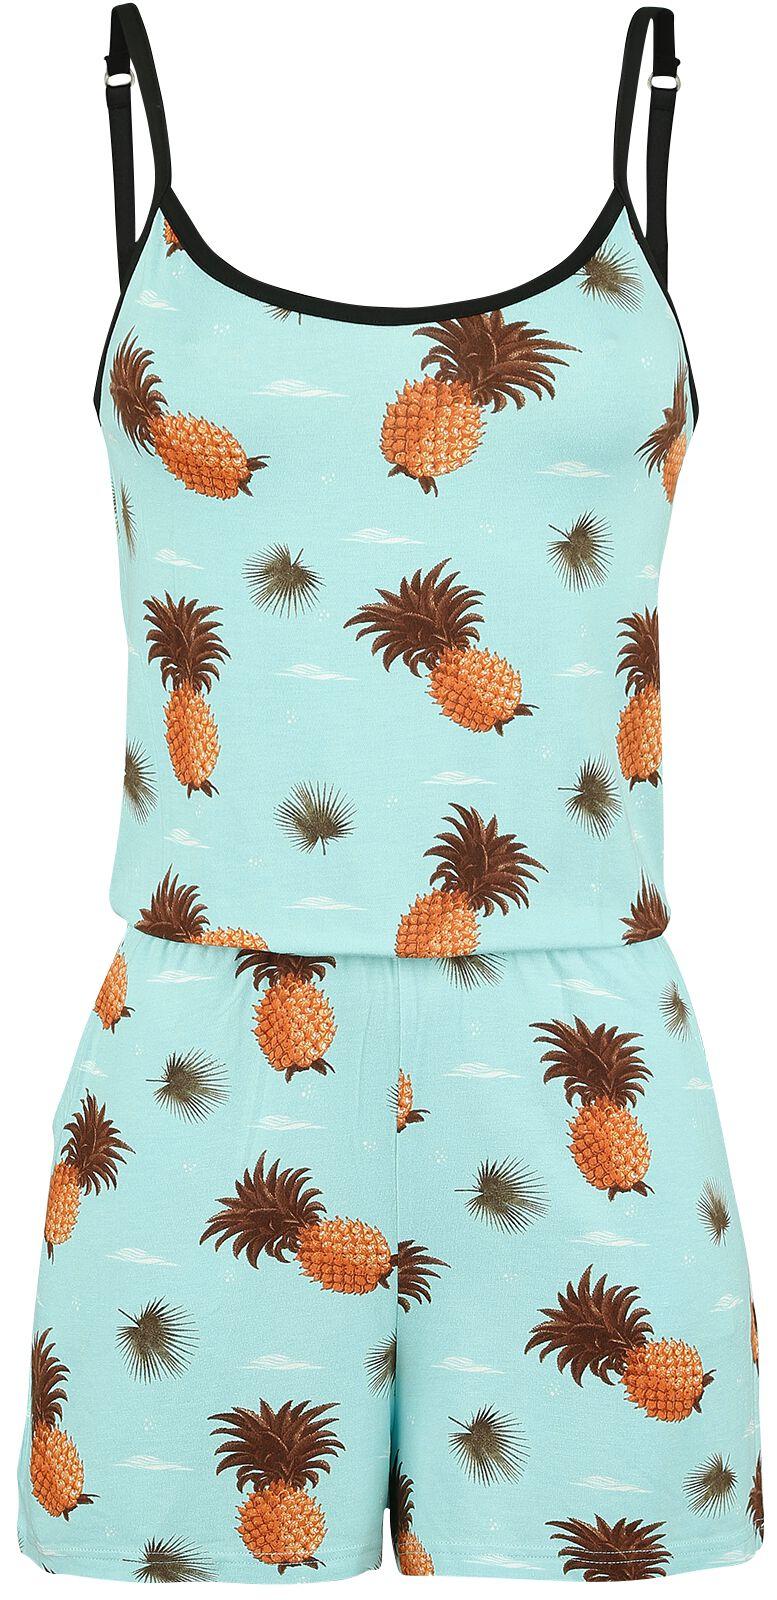 Image of   Pussy Deluxe Pineapple Dream Jumpsuit Jumpsuit blå